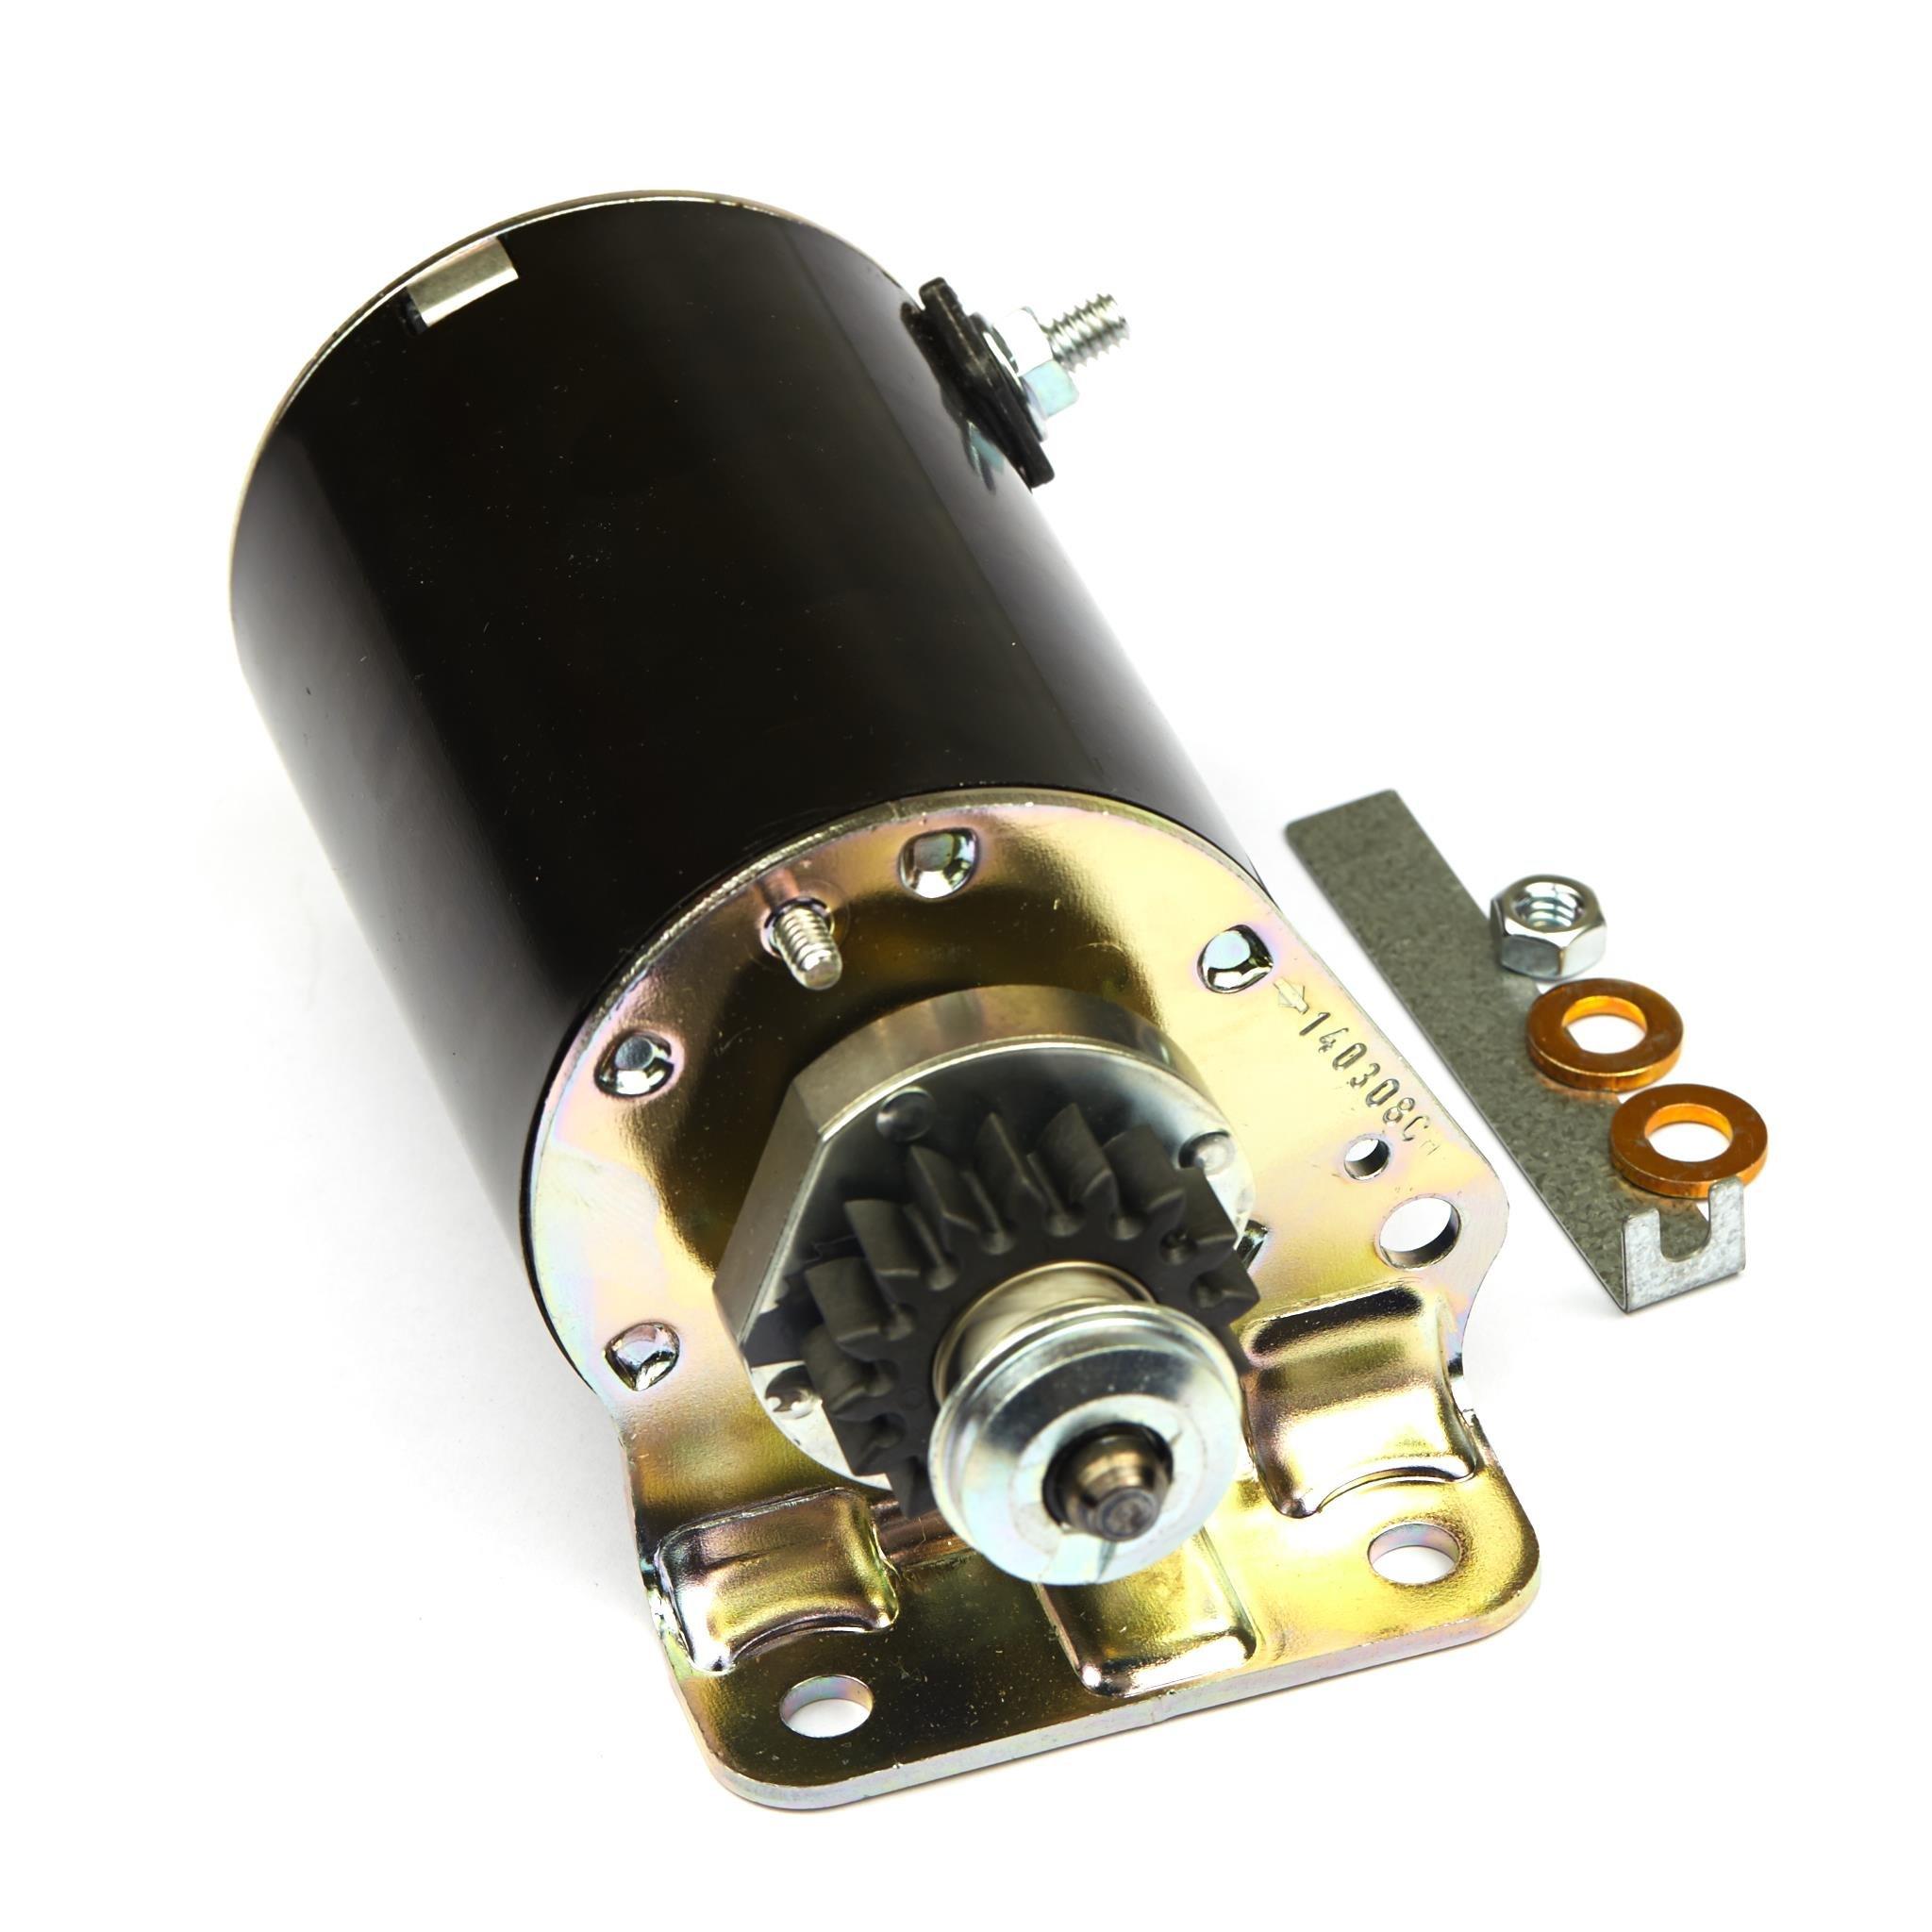 Briggs & Stratton 795121 Starter Motor Replaces 499521/497461/497401 by Briggs & Stratton